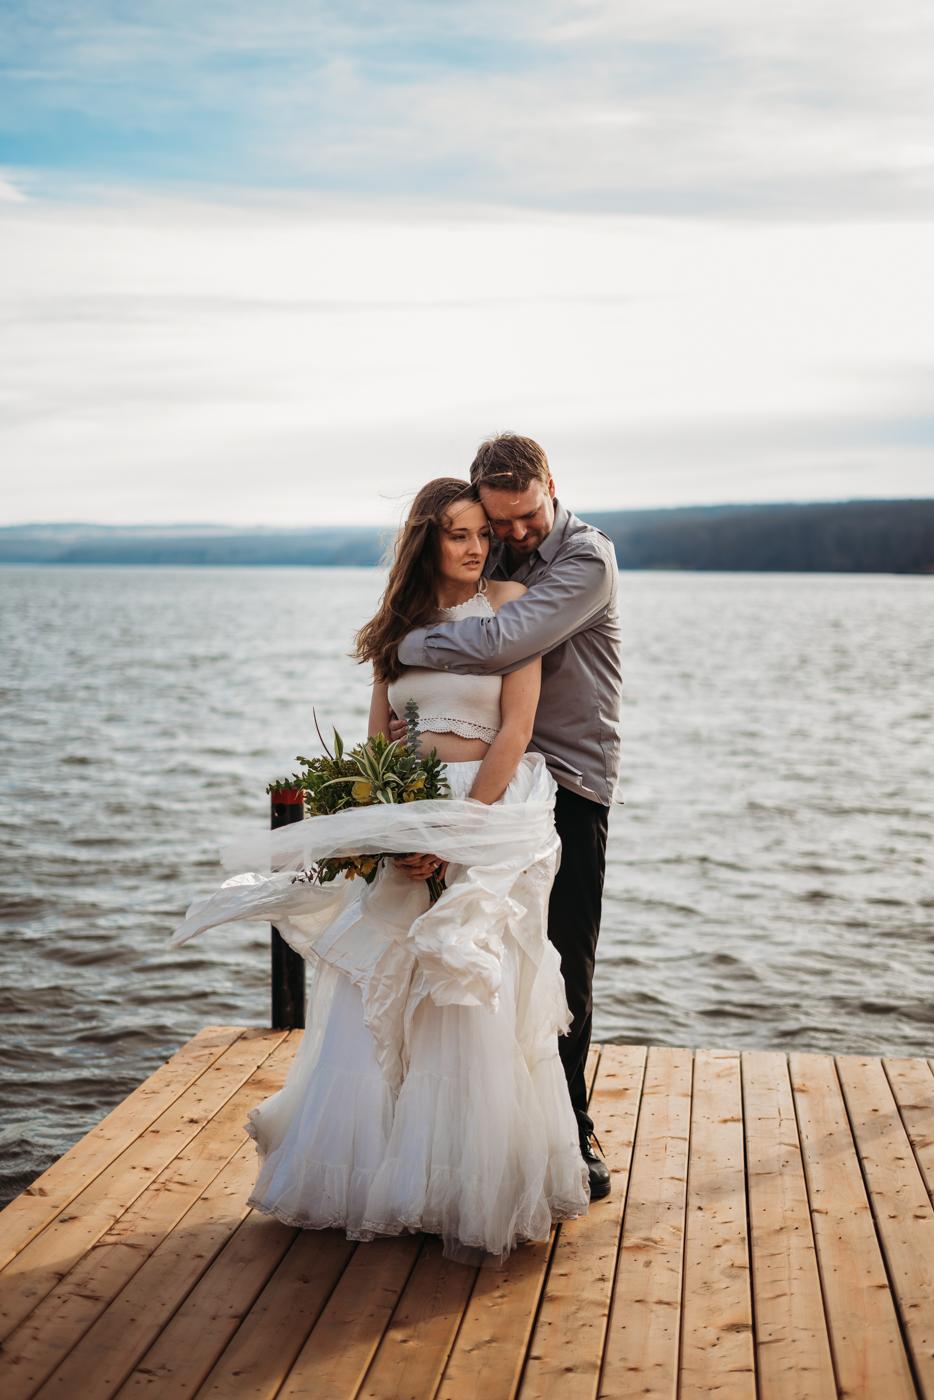 FortSt.John_photographer_TyraEPhotography_Wedding_Couple_Family_Photograhy_DawsonCreek_Elopement_Bride_Boduoir_Portraits-46.jpg